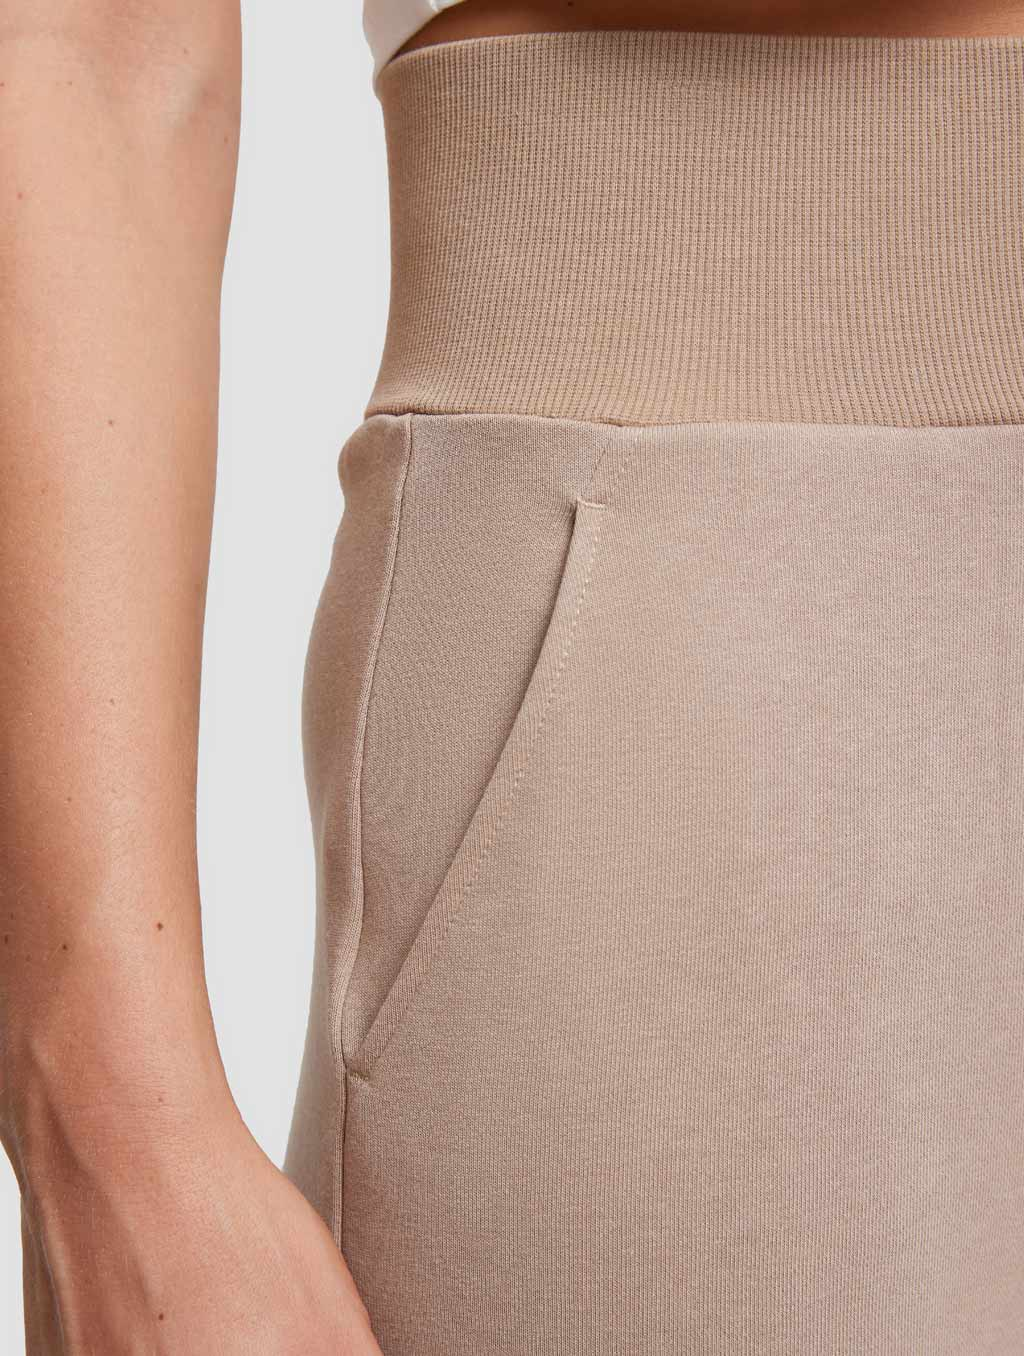 High-waist Threaded Slit Sweatpant-detail- Caramel